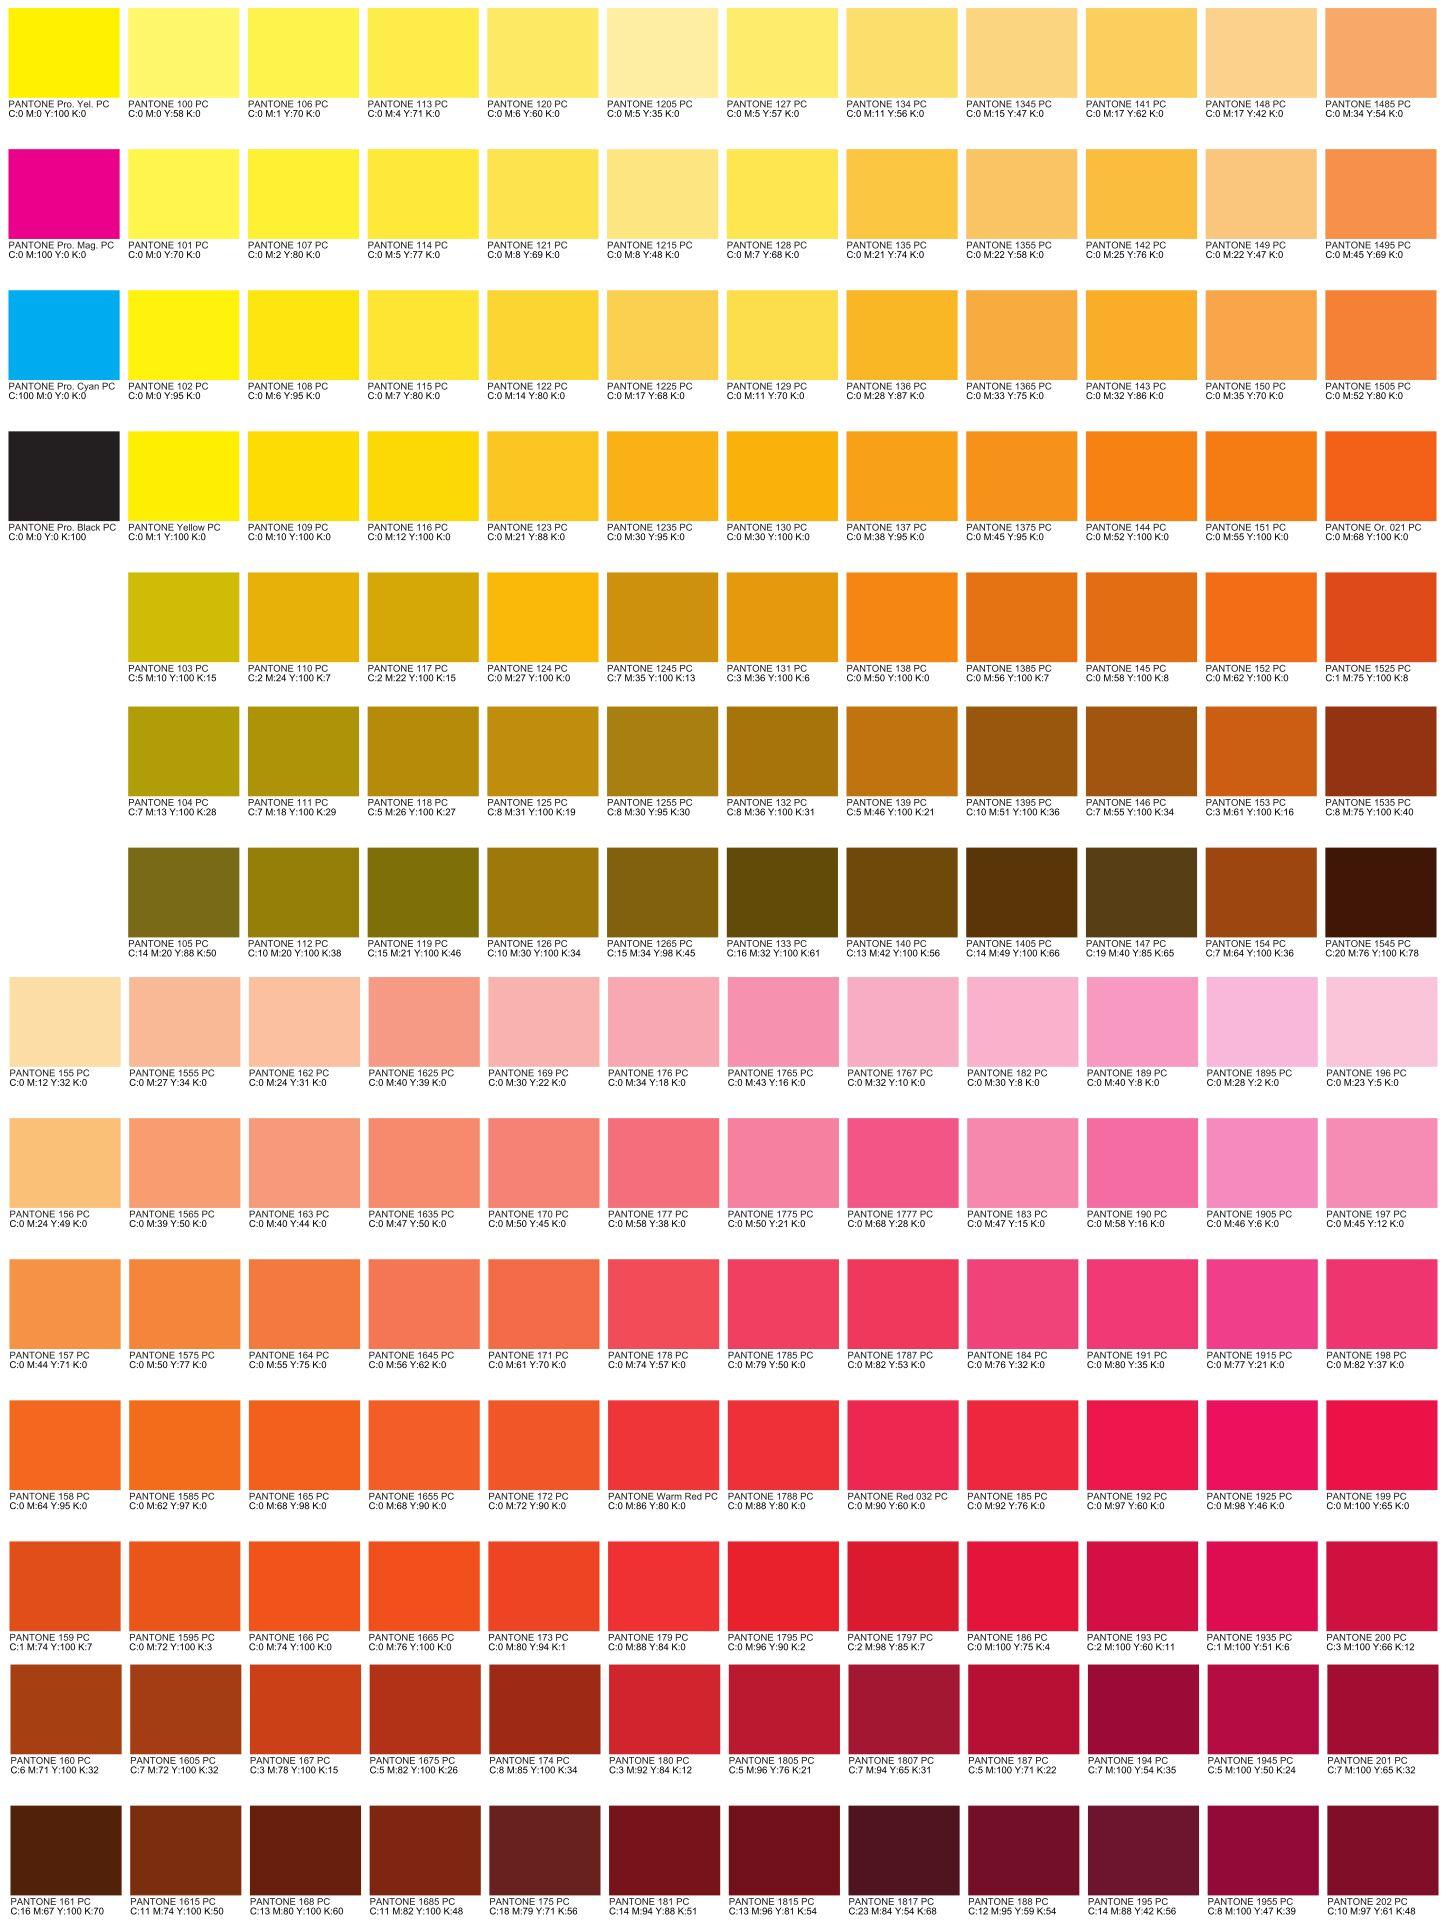 CMYK color code charts   Design   Pinterest   Adobe ...